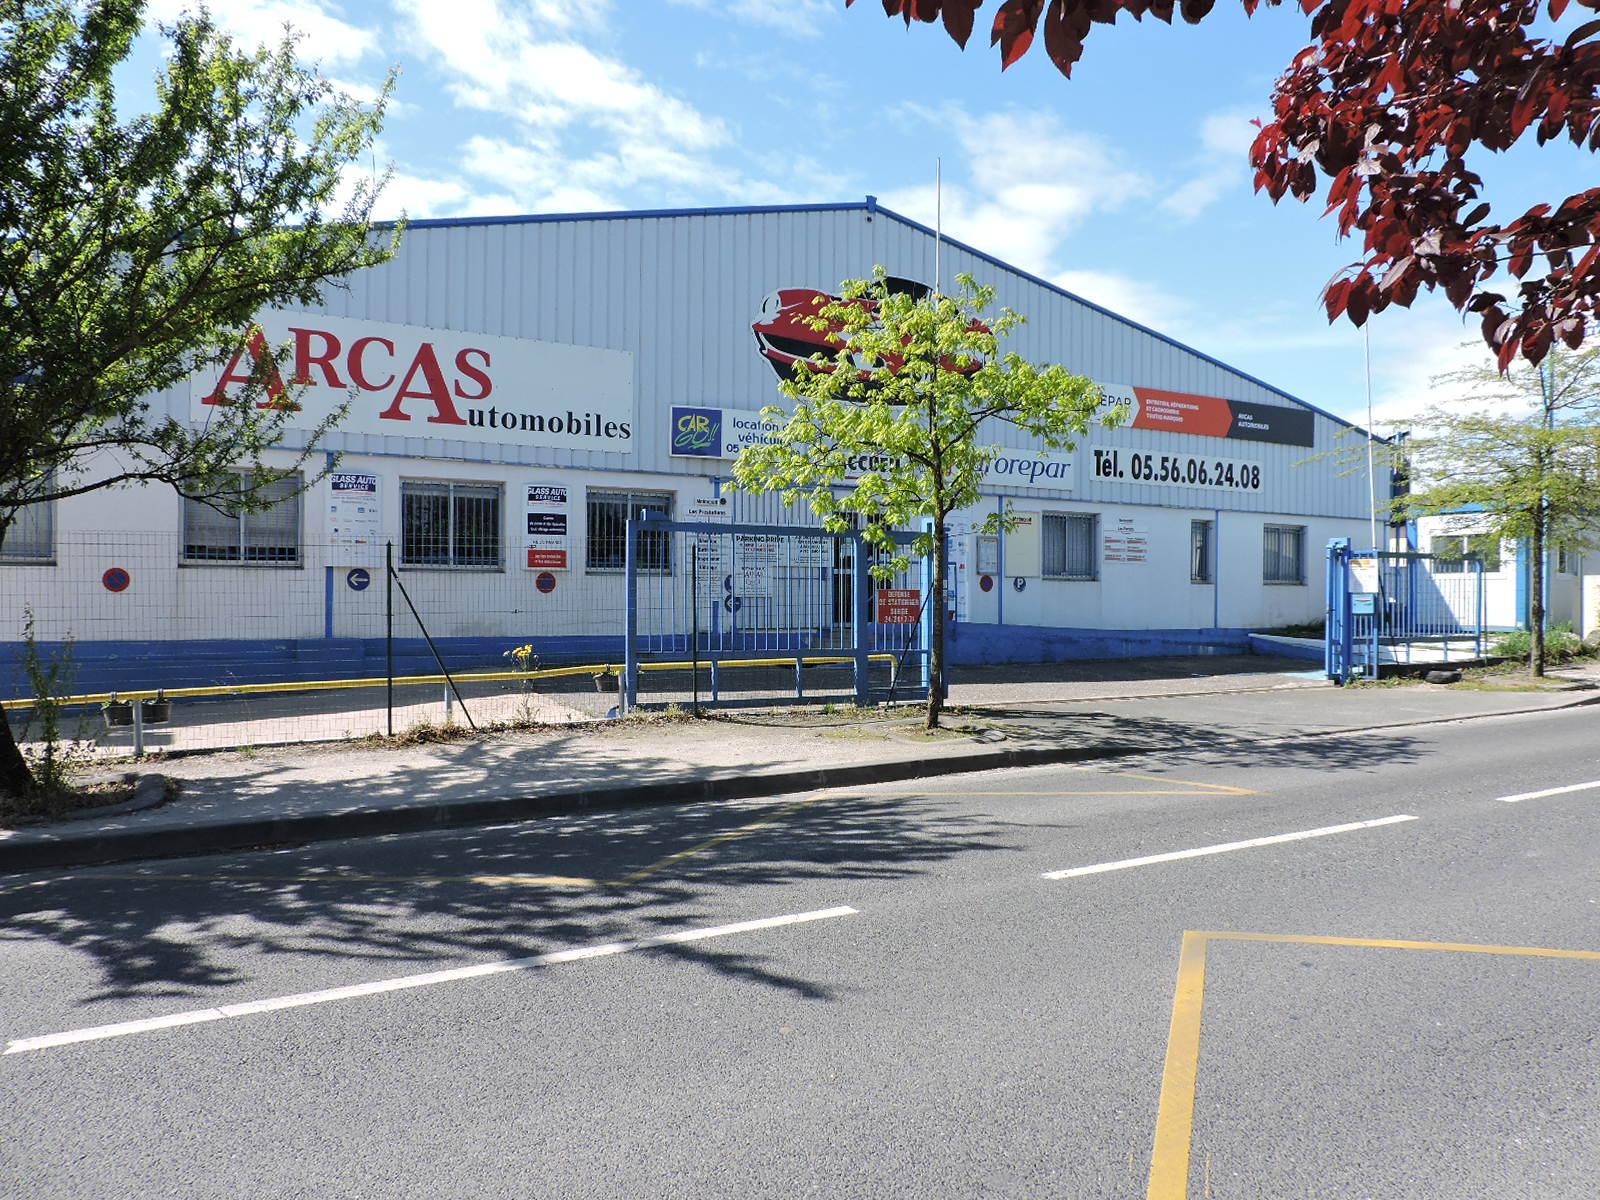 ARCAS AUTOMOBILES